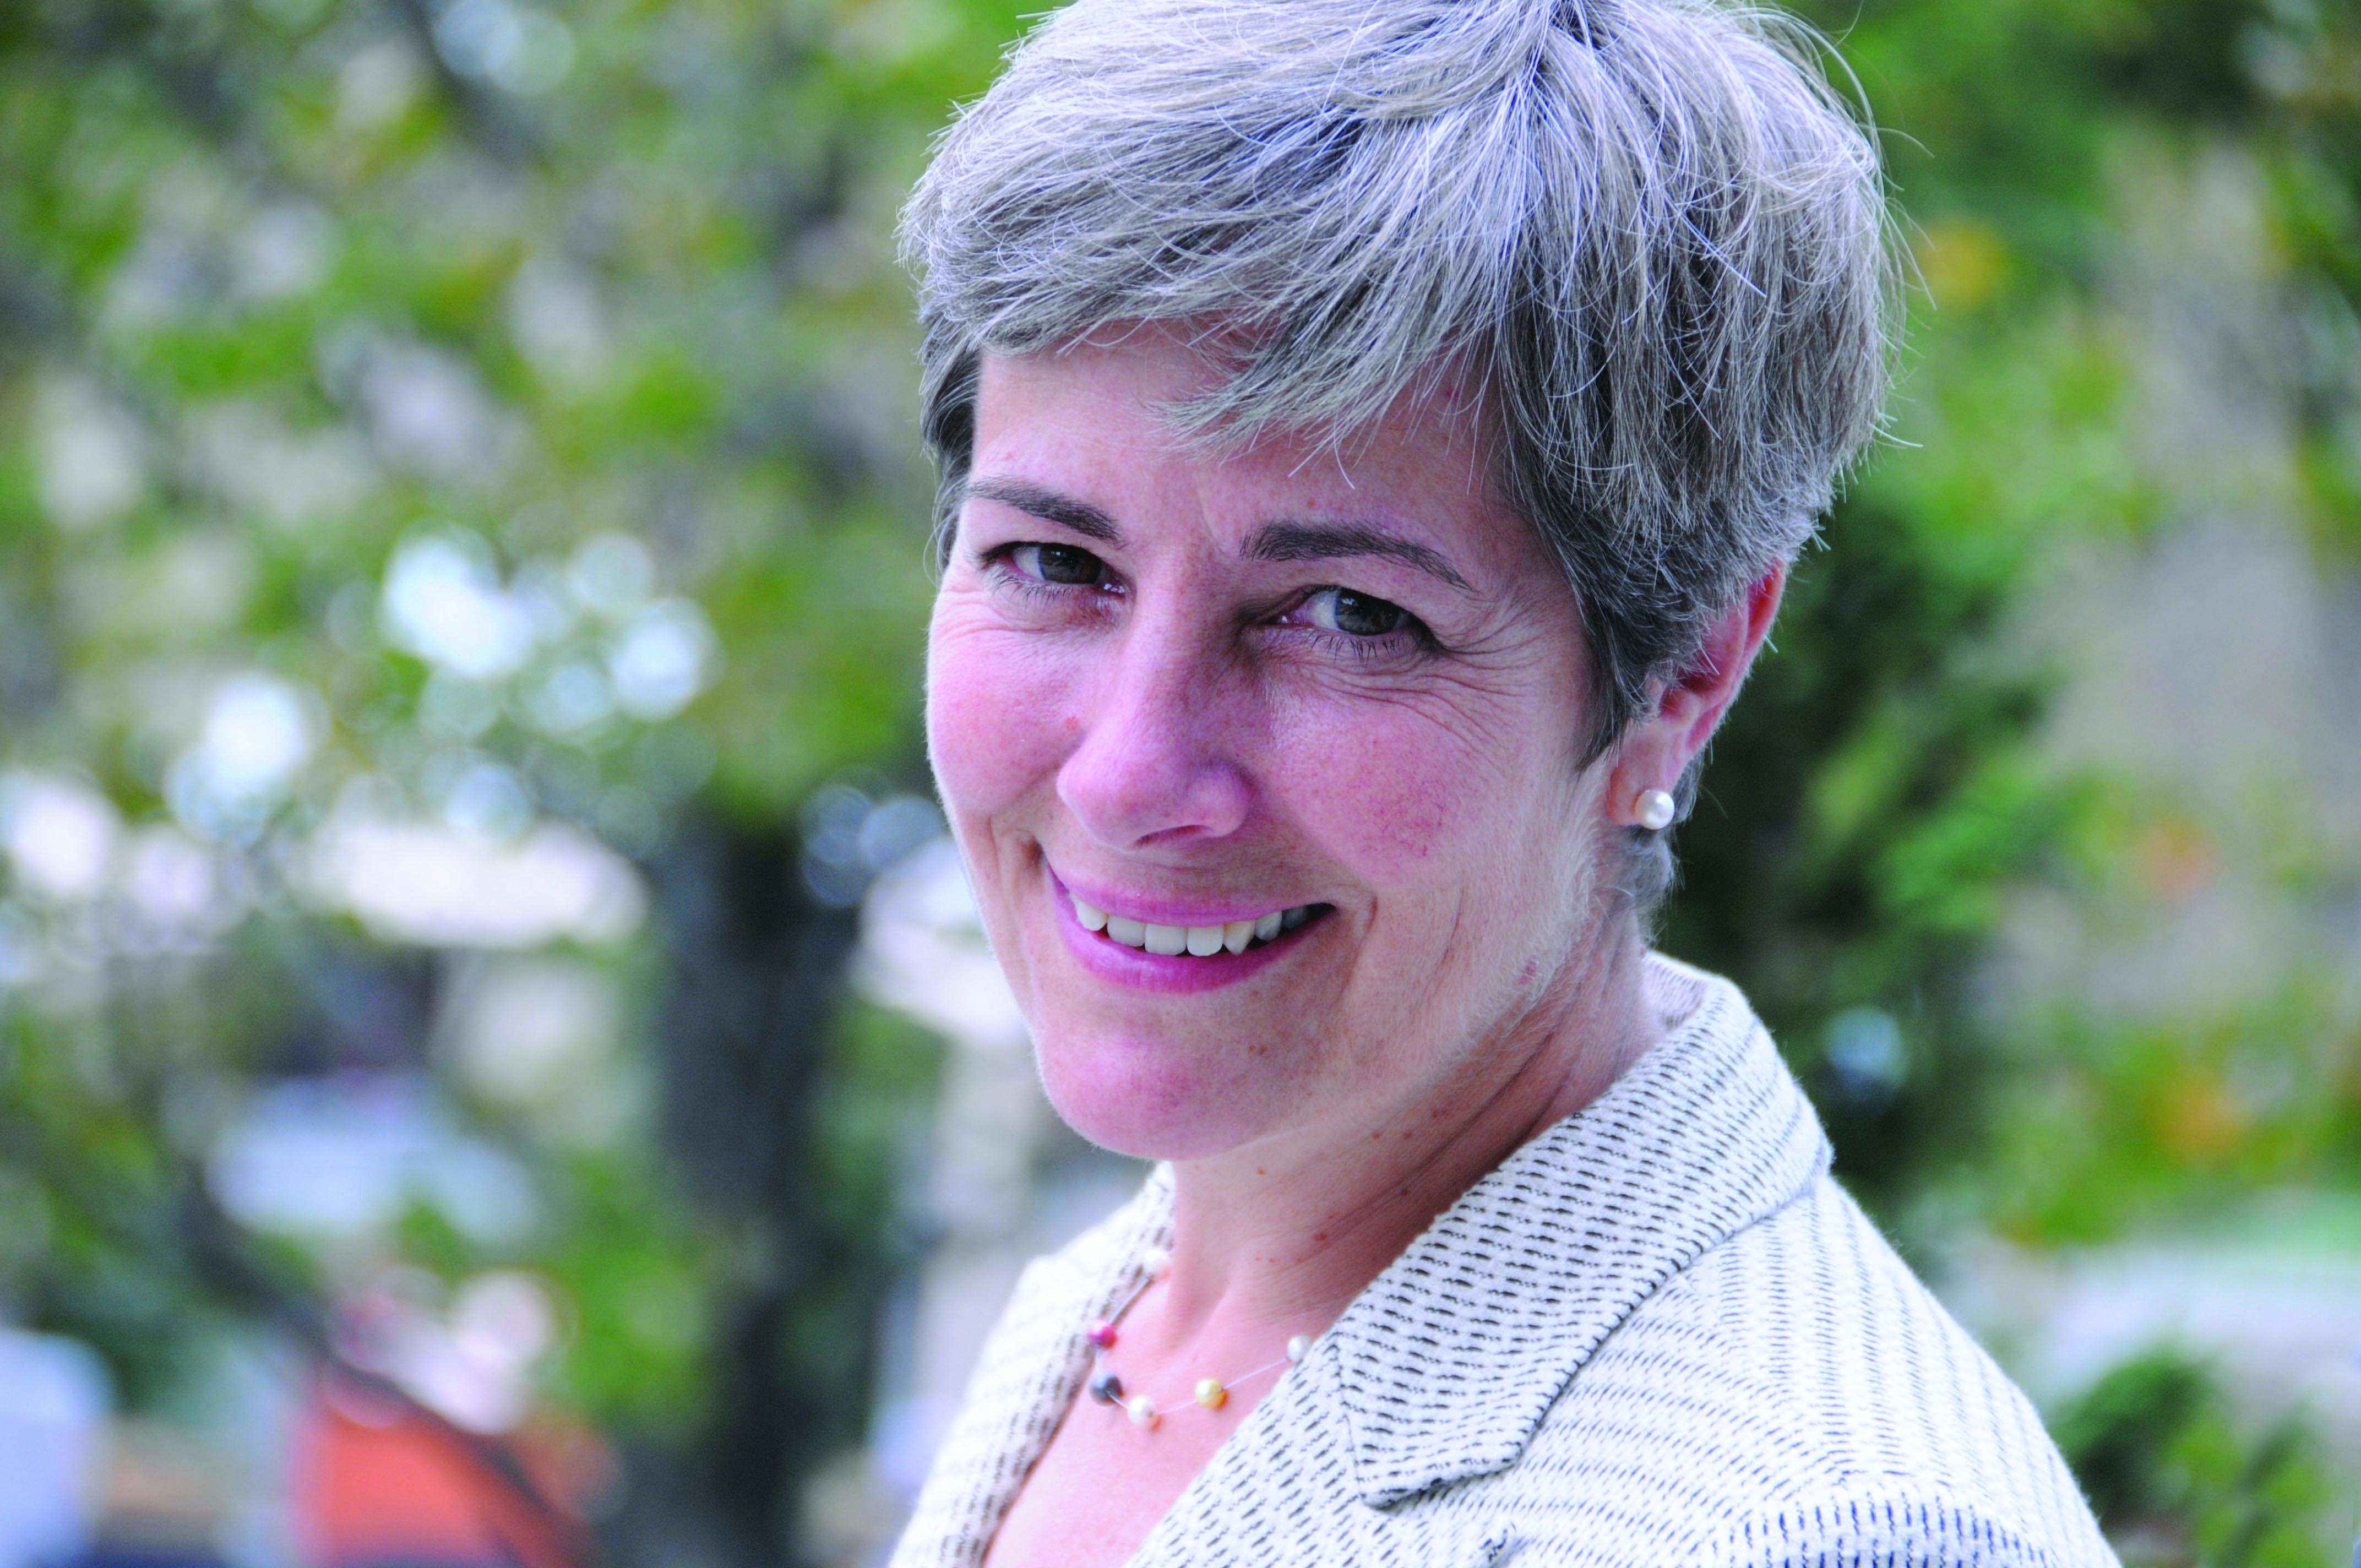 Virginia Burt